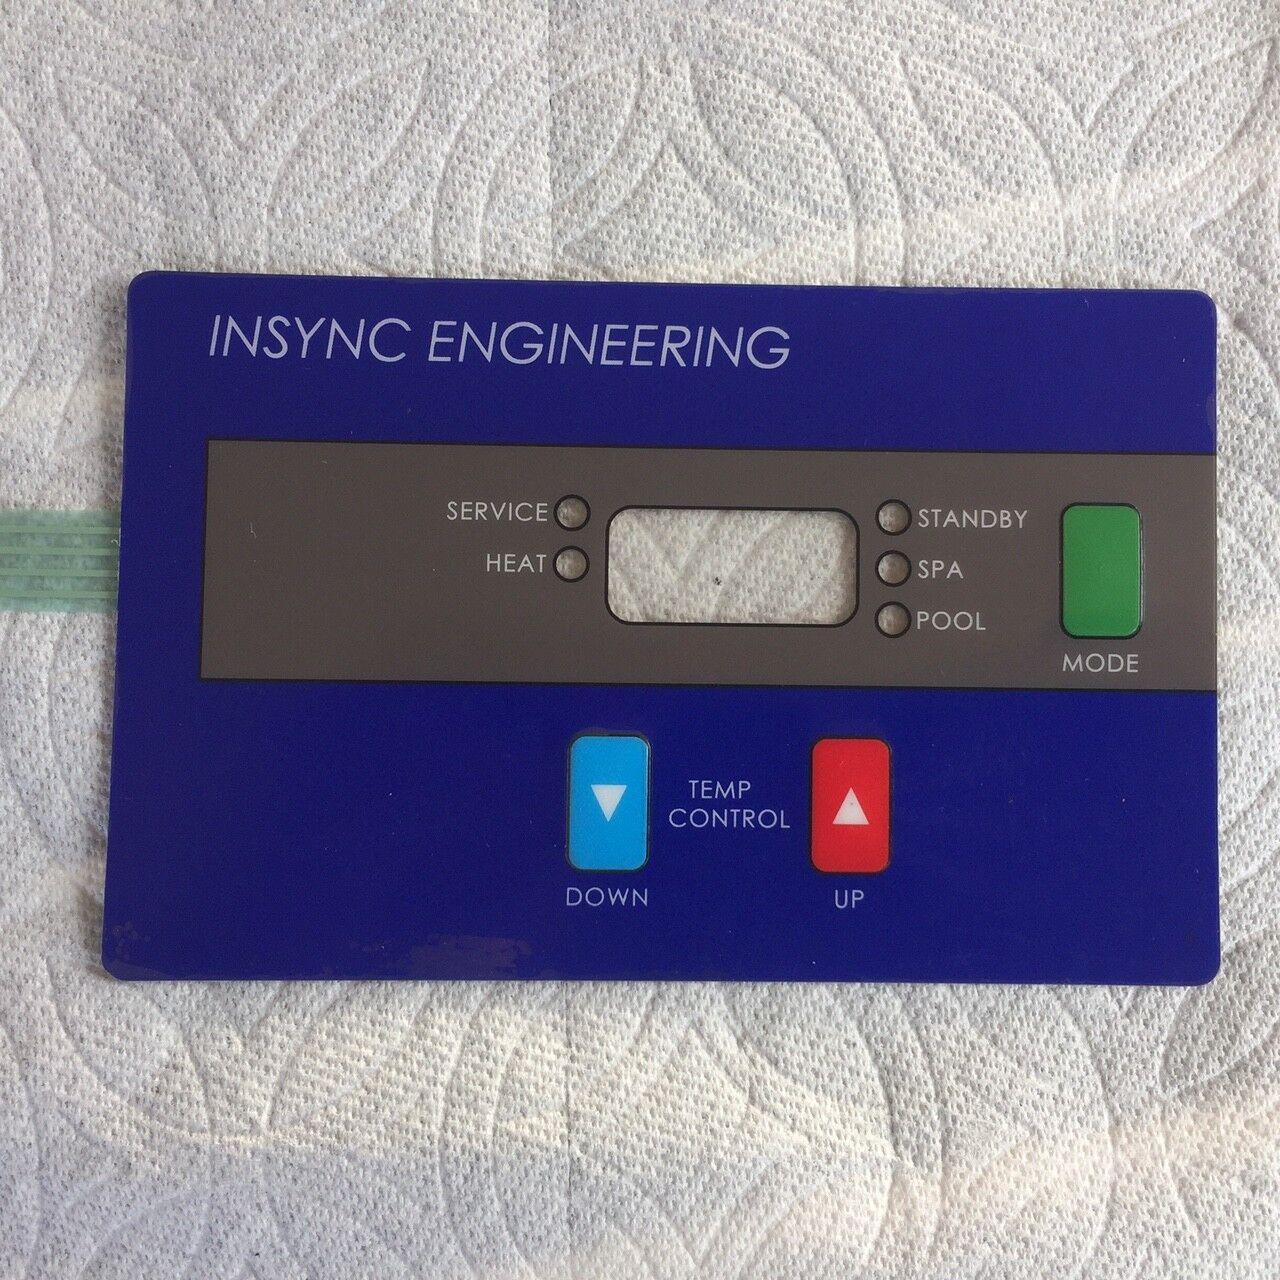 Hayward Keypad NEW compatible FDXLHBP1400 Blau FDXLBKP1932 heaters by INSYNC ENG